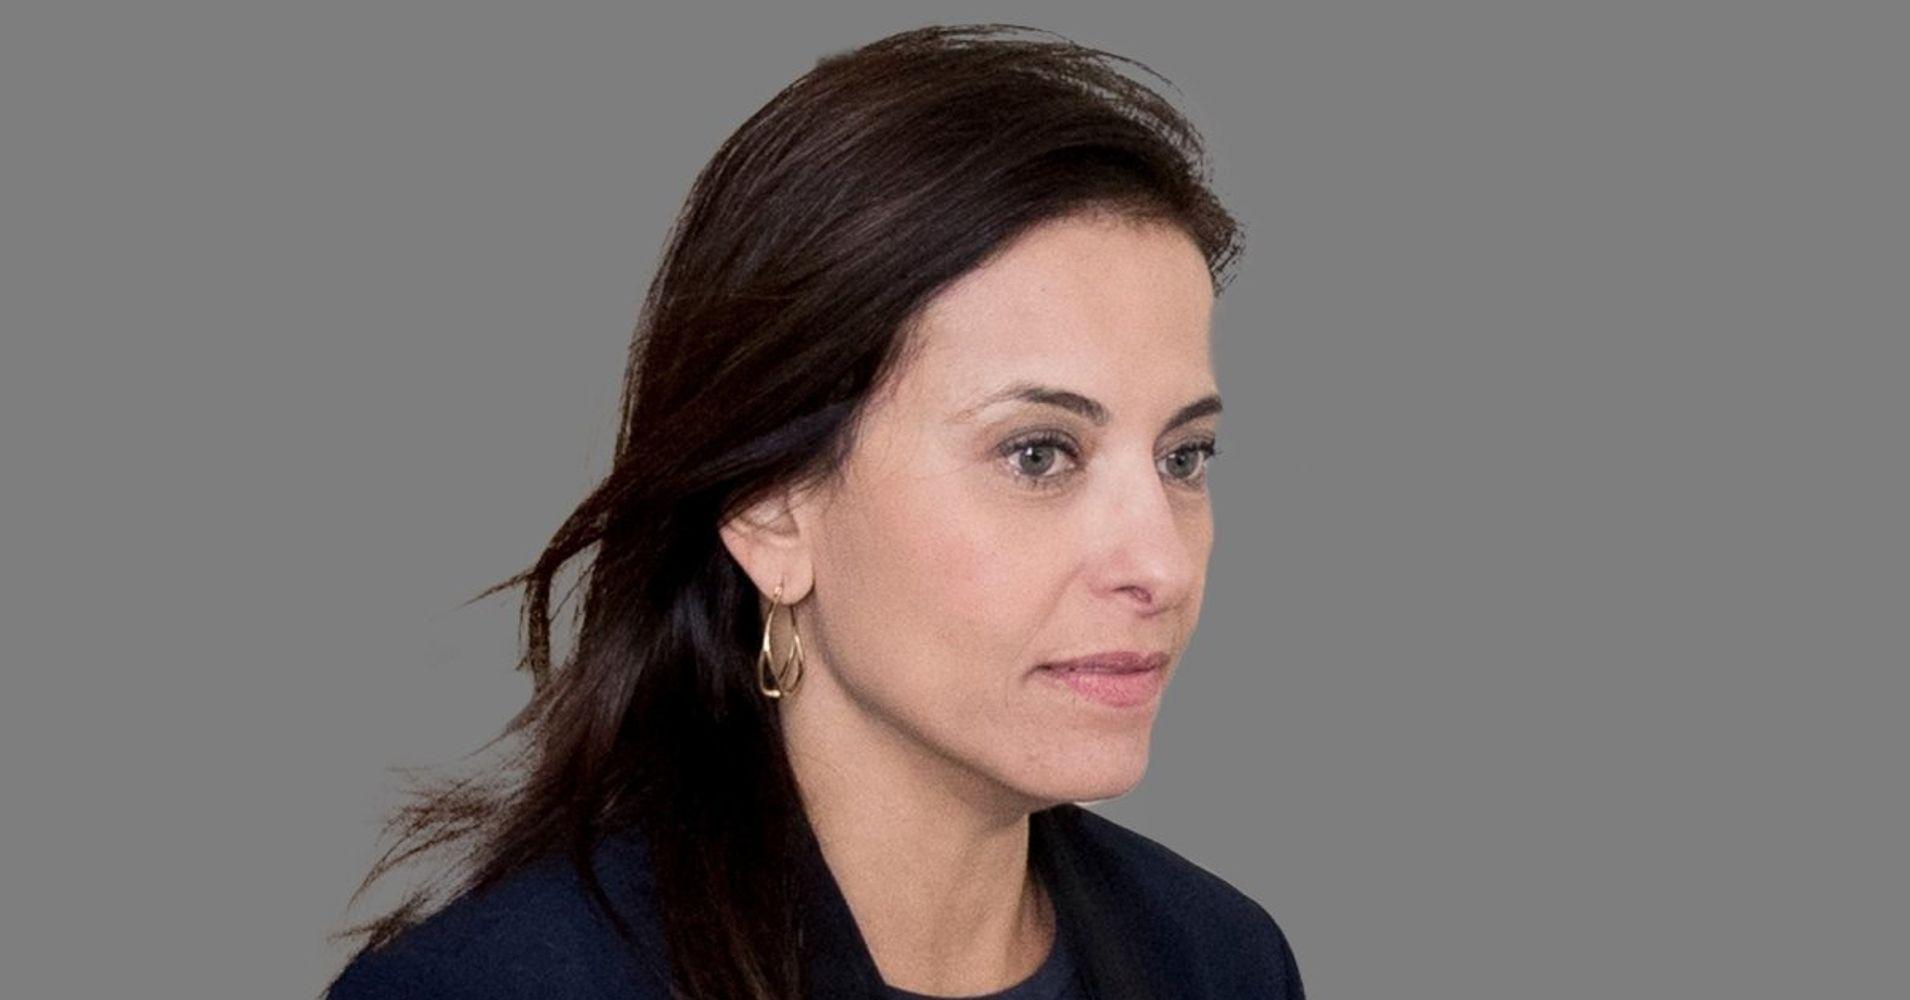 Dina Powell Withdraws Her Name From UN Ambassador Consideration